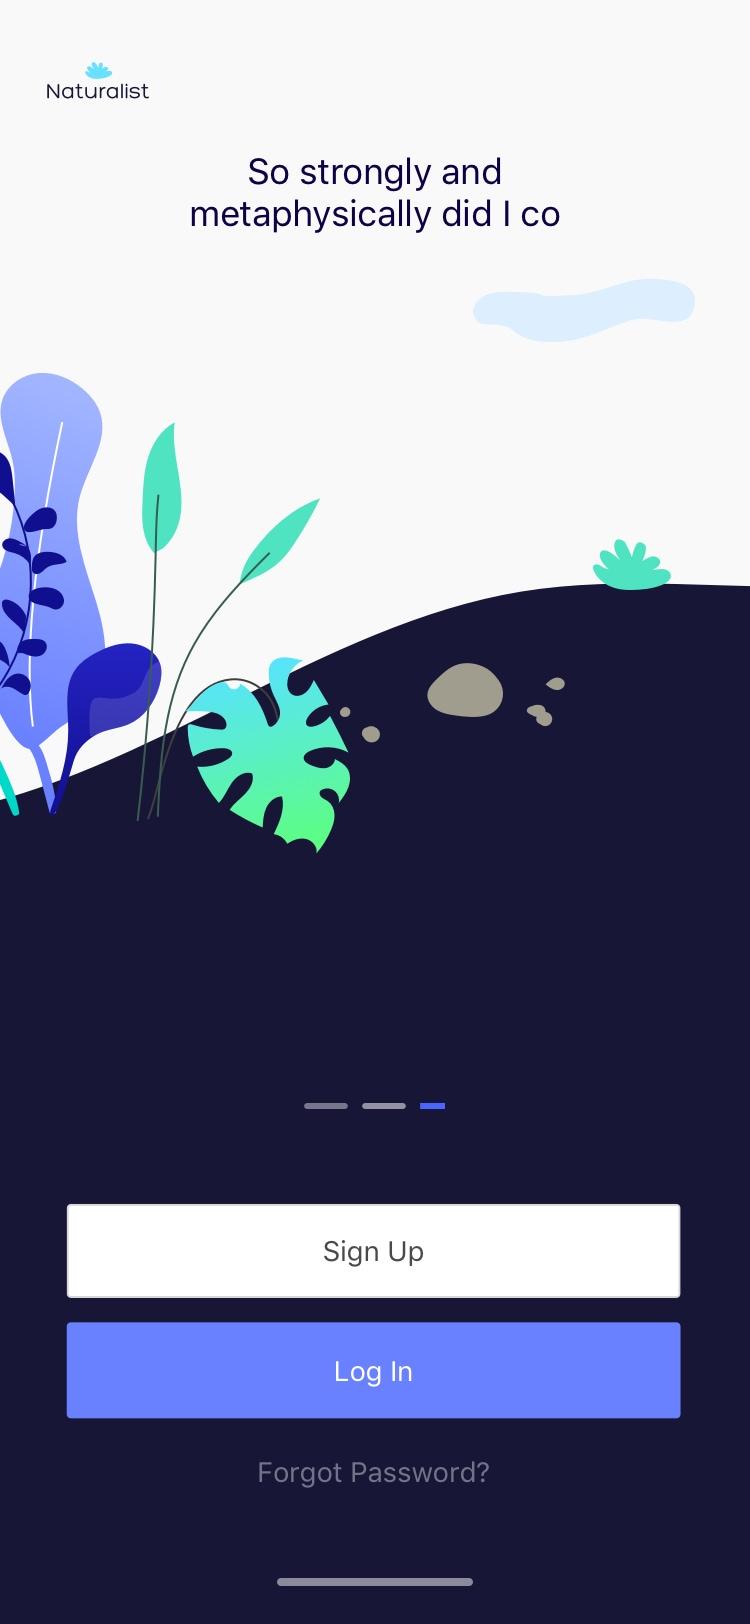 Naturalist Onboarding Freebie - Minimal and clean app design, includes 3 screens